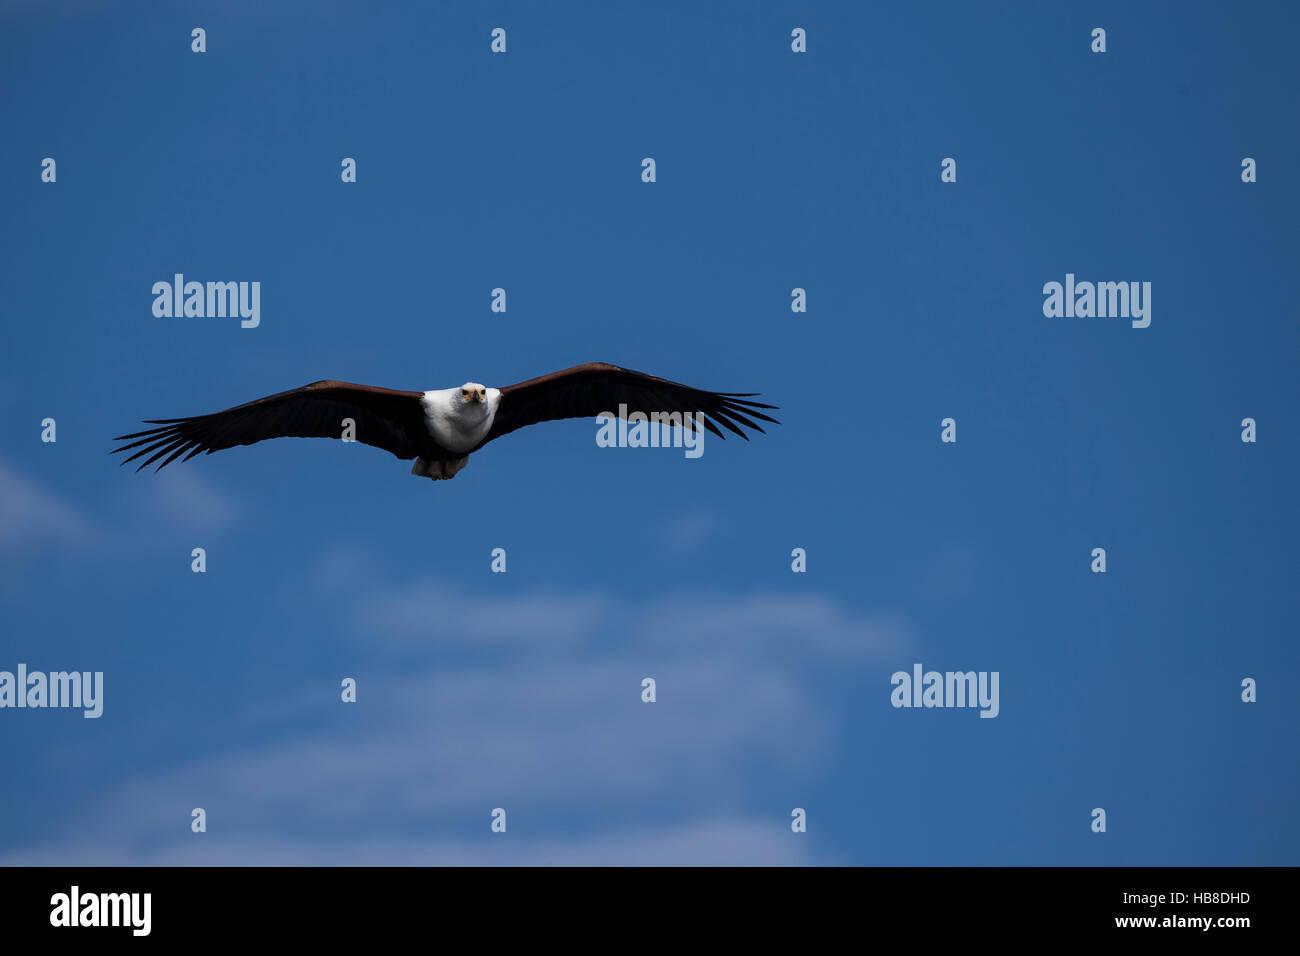 Flying fish eagle (Haliaeetus vozier), Chobe National Park, Botswana Stock Photo